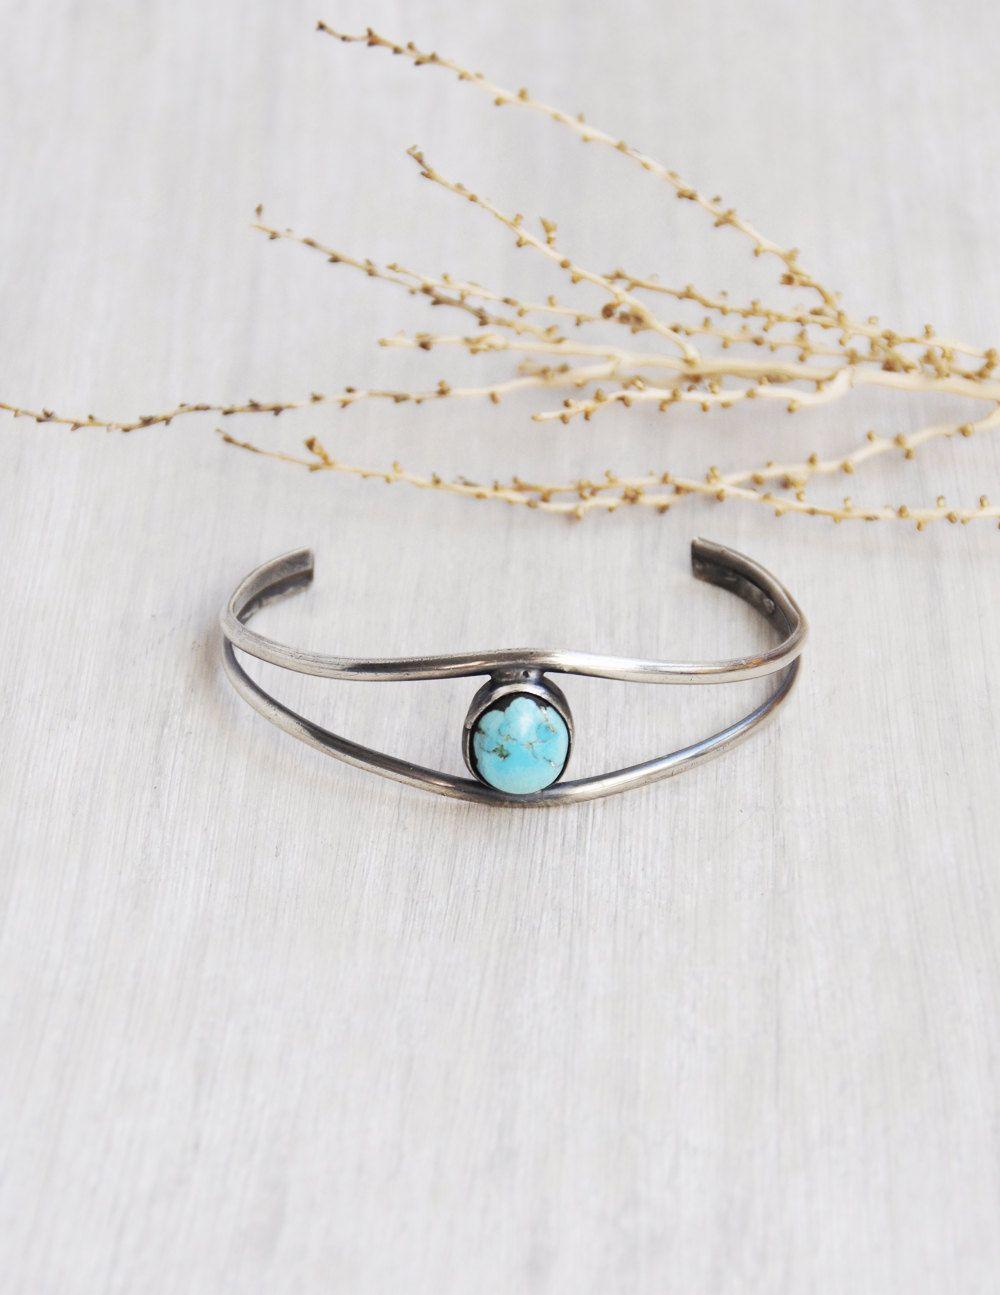 Retro Turquoise Silver Chain Bracelet Handmade Fashion Cuff Bracelet Jewelry